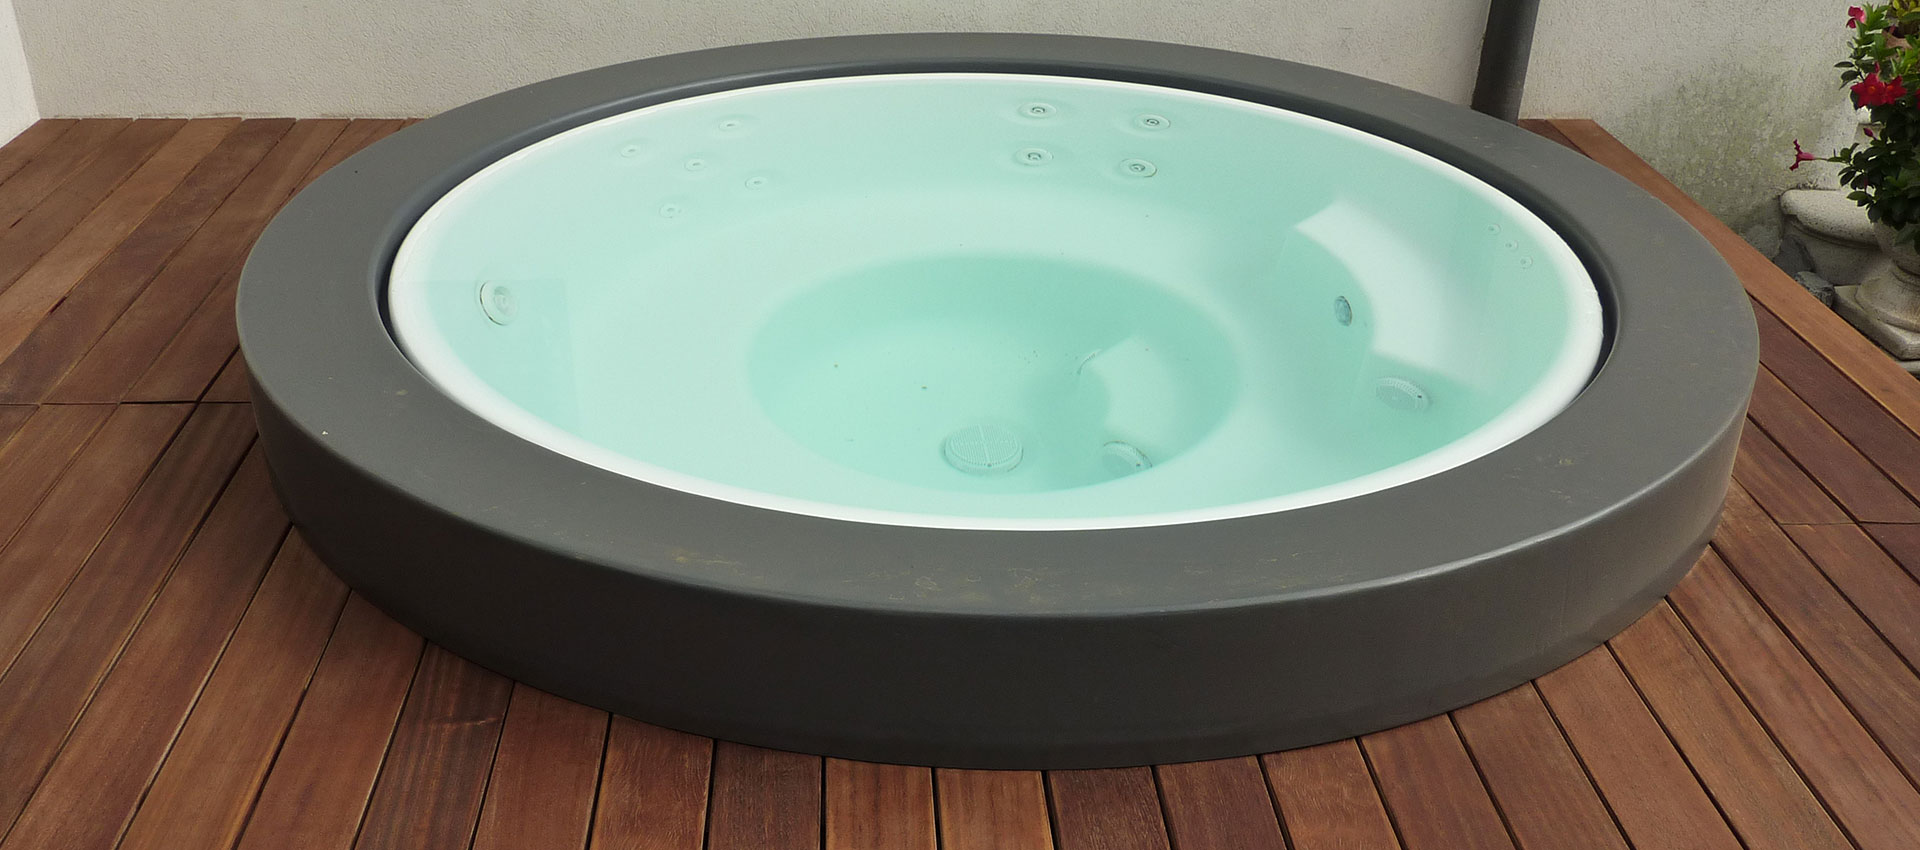 Rivestimento vasca idromassaggio legno iroko